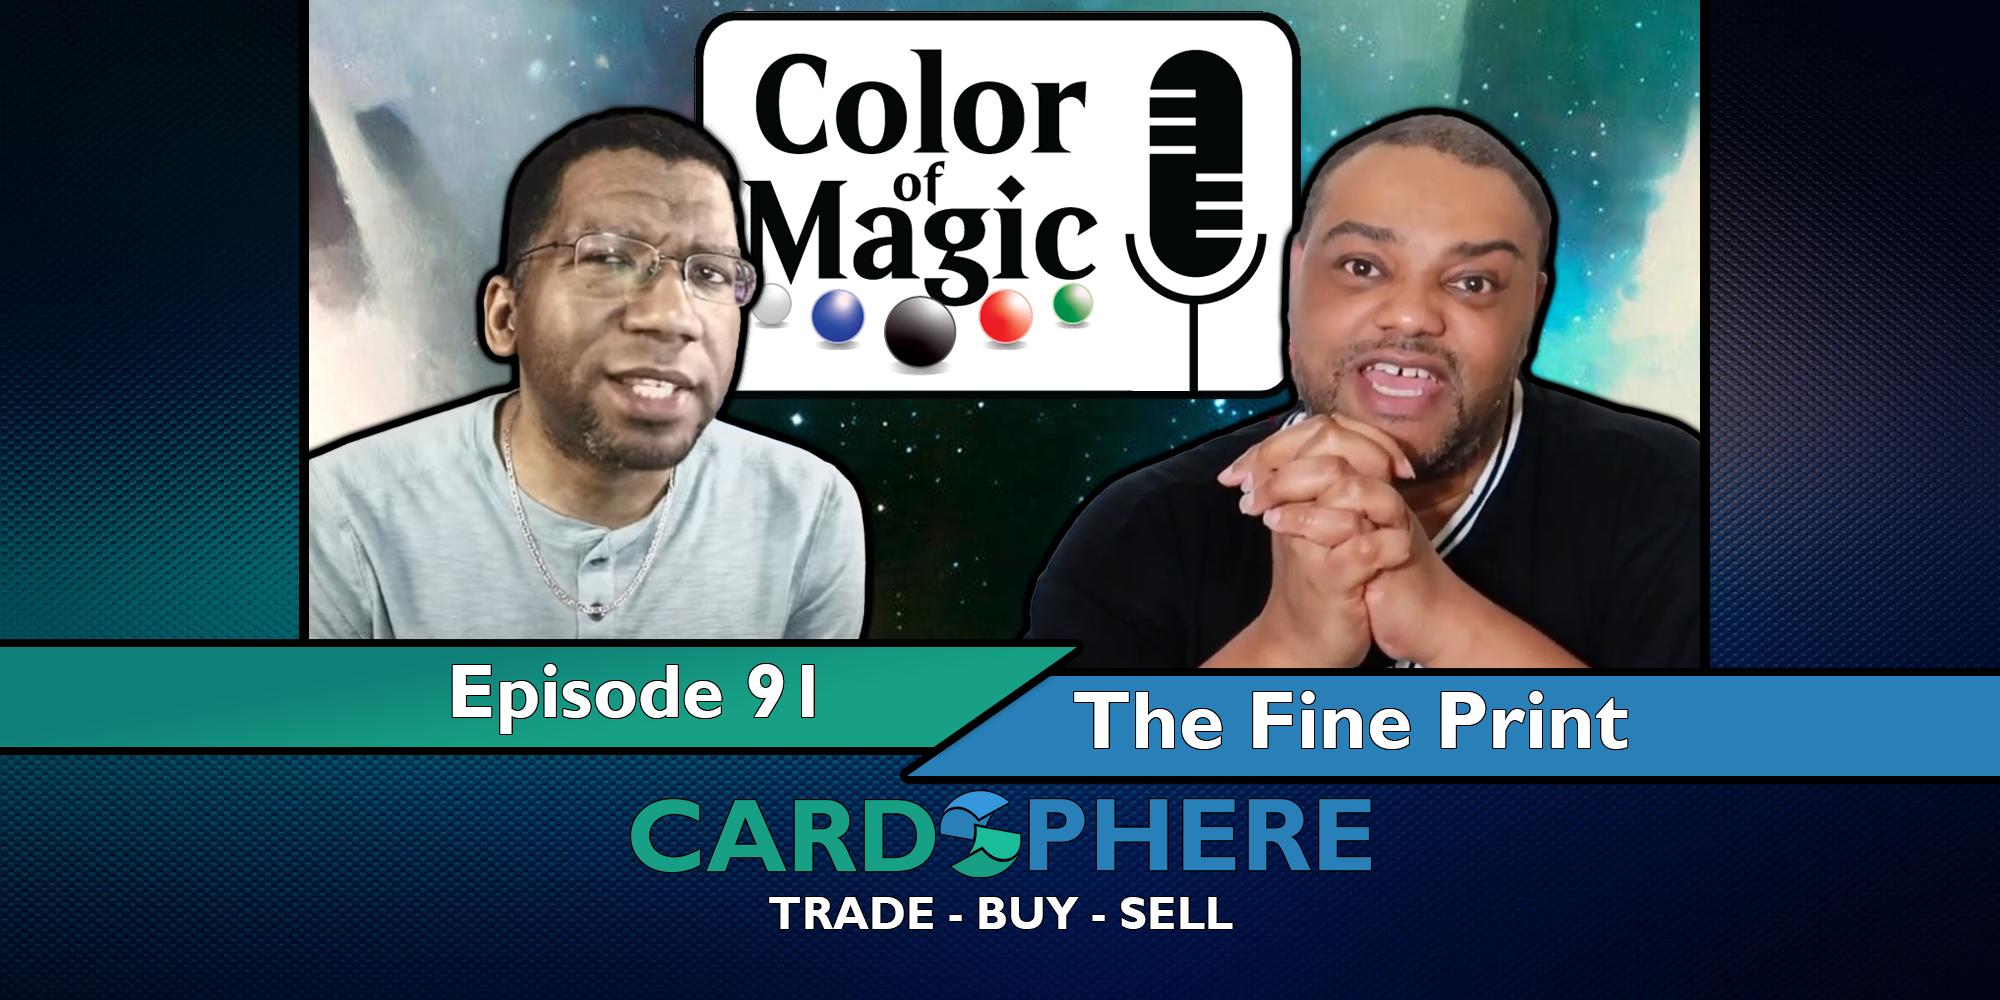 Color of Magic Episode 91 - The Fine Print